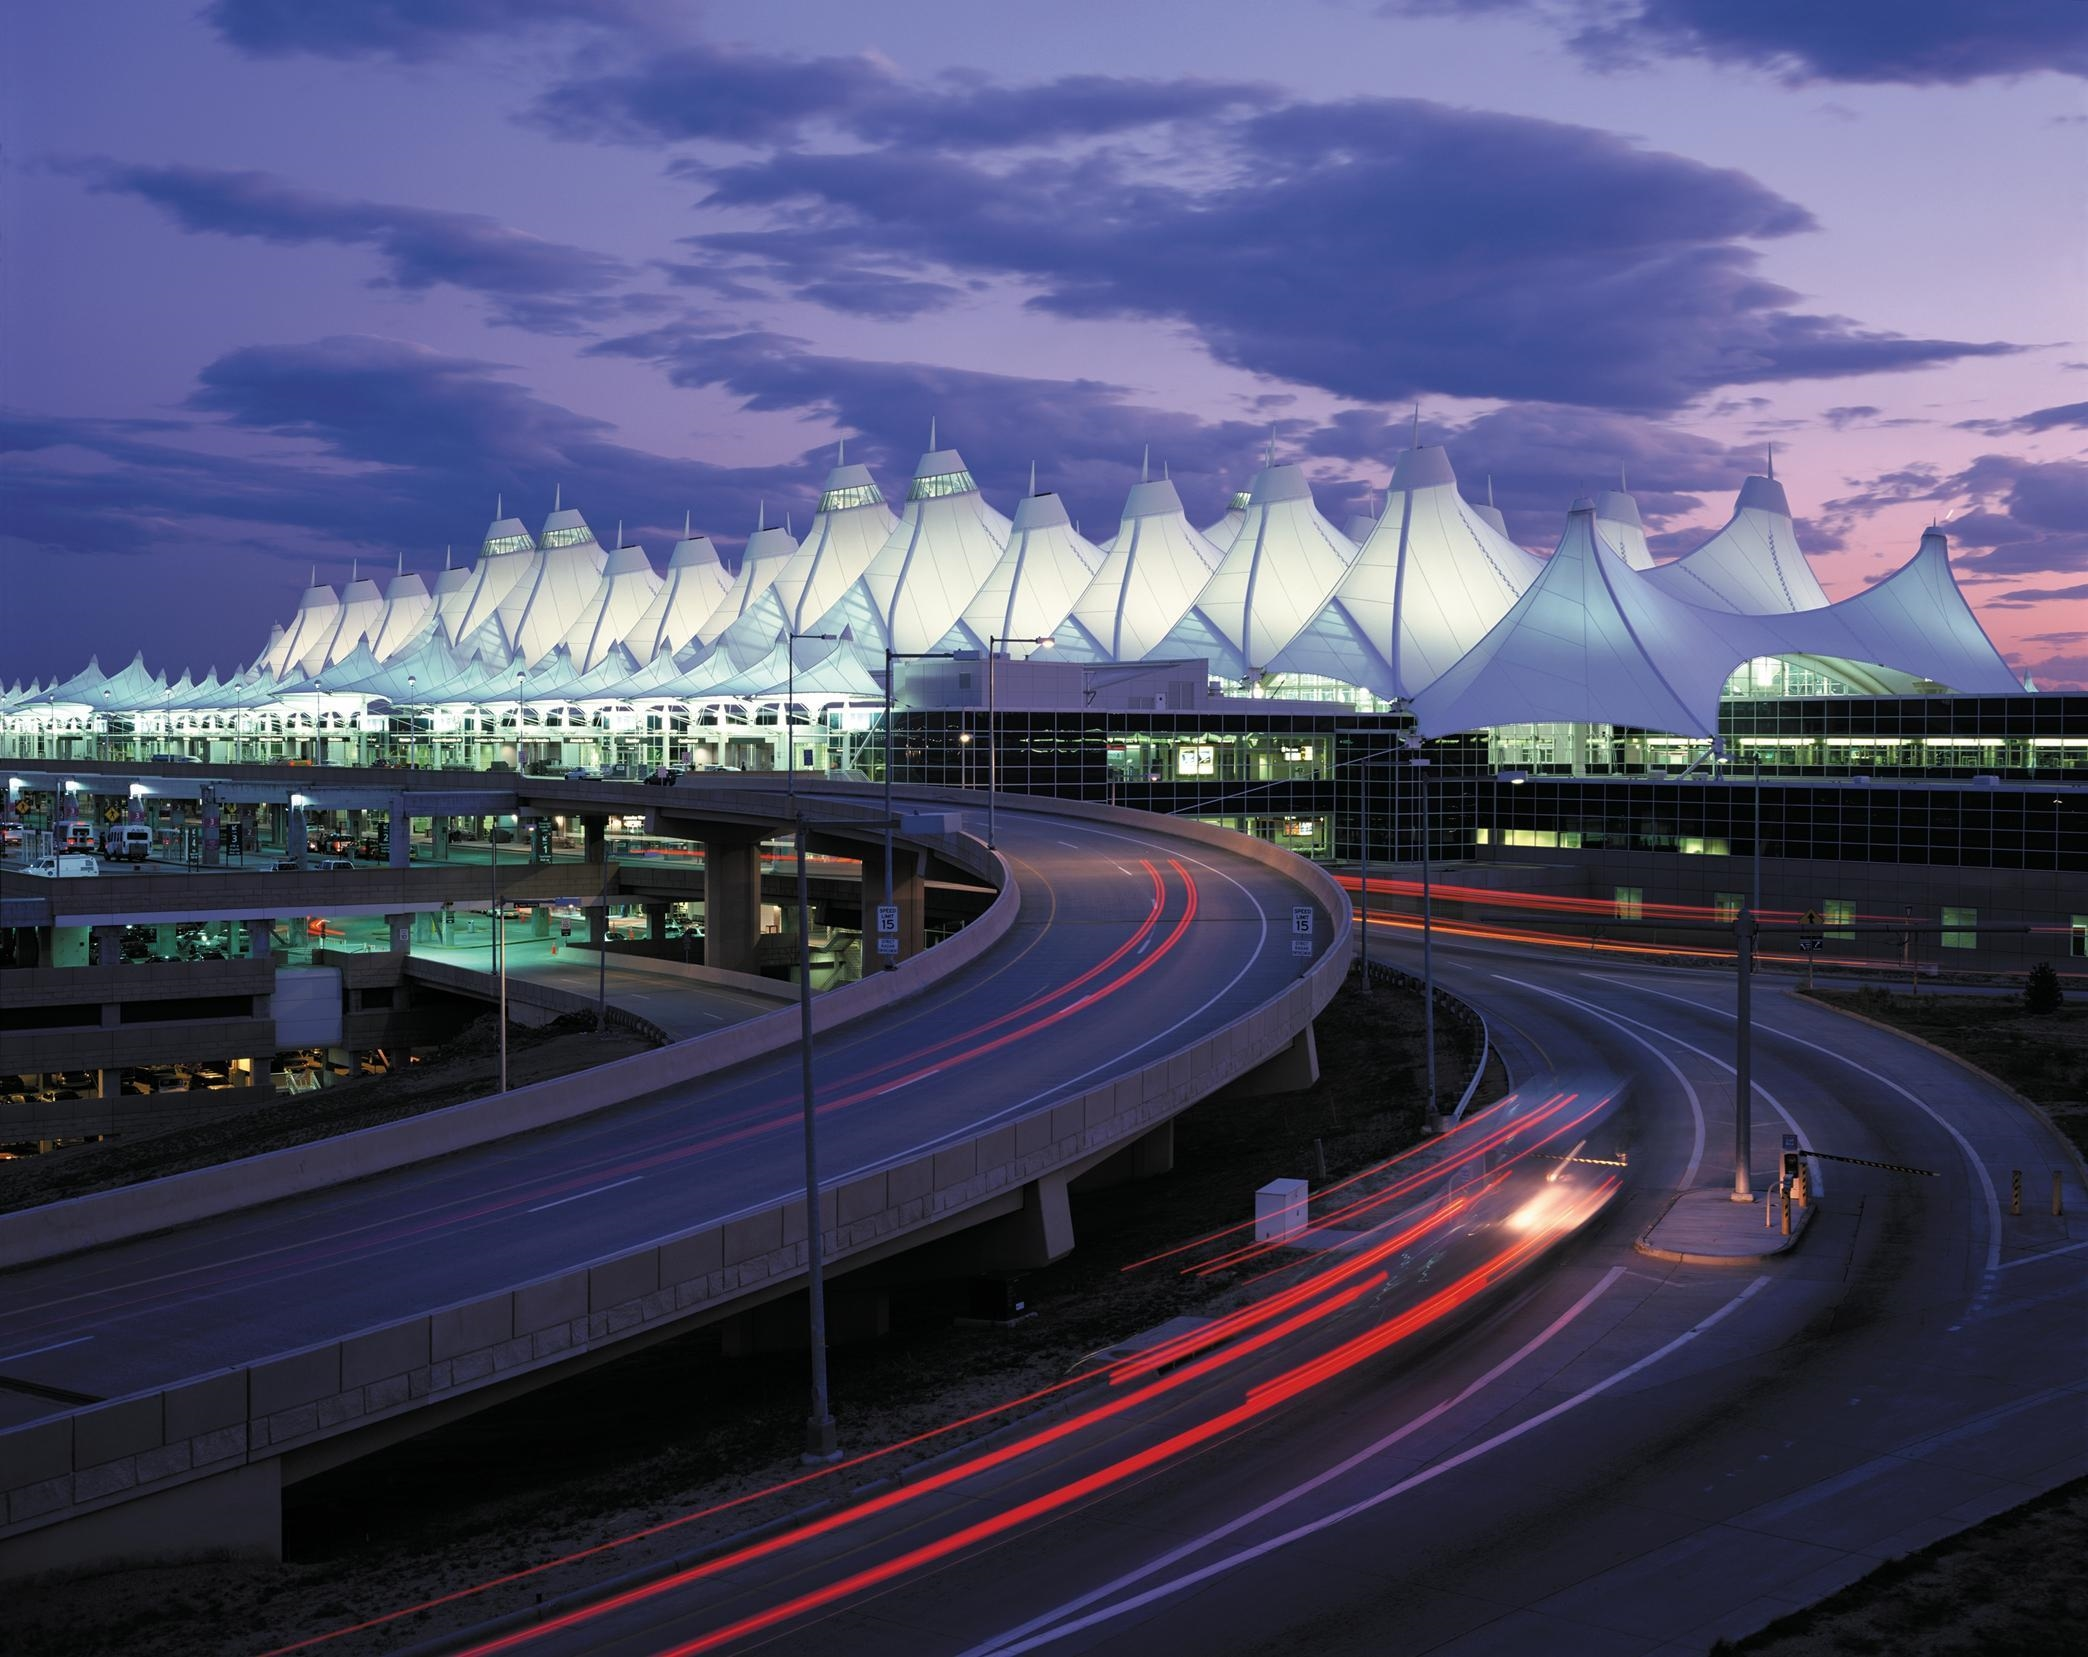 Homewood Suites by Hilton Denver International Airport image 12